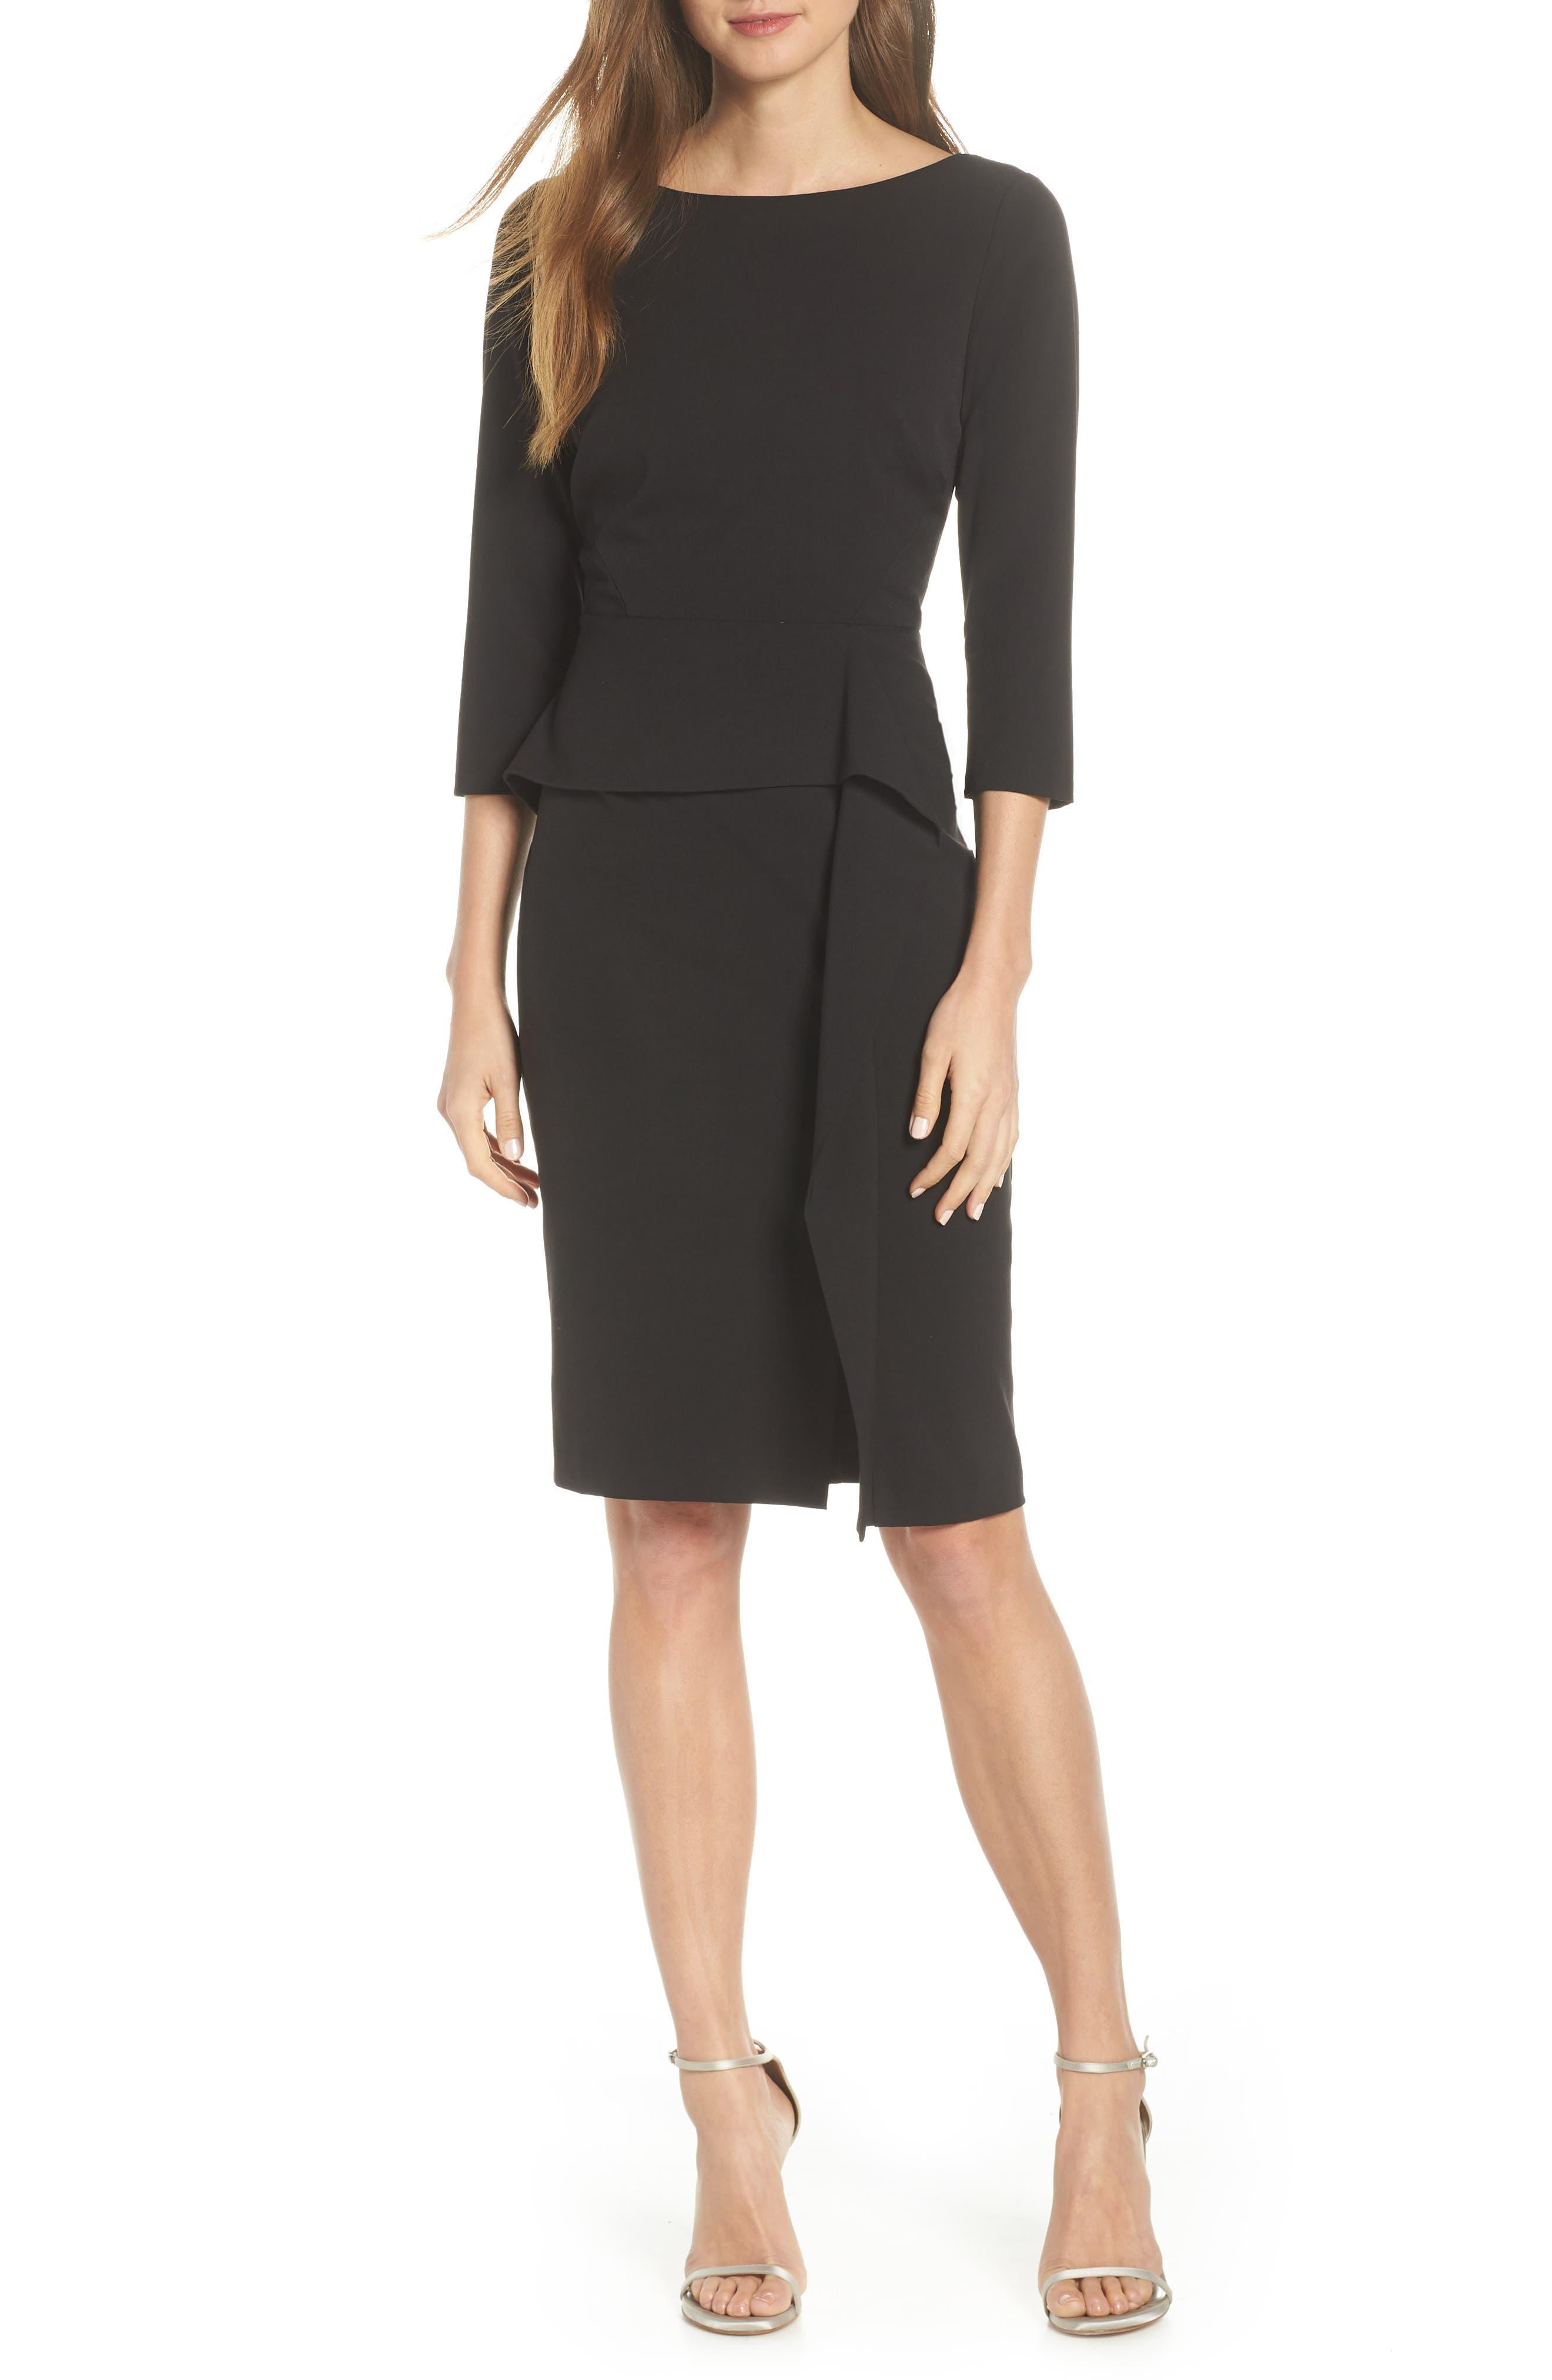 VINCE CAMUTO Angled Ruffle Sheath Dress, Main, color, BLACK